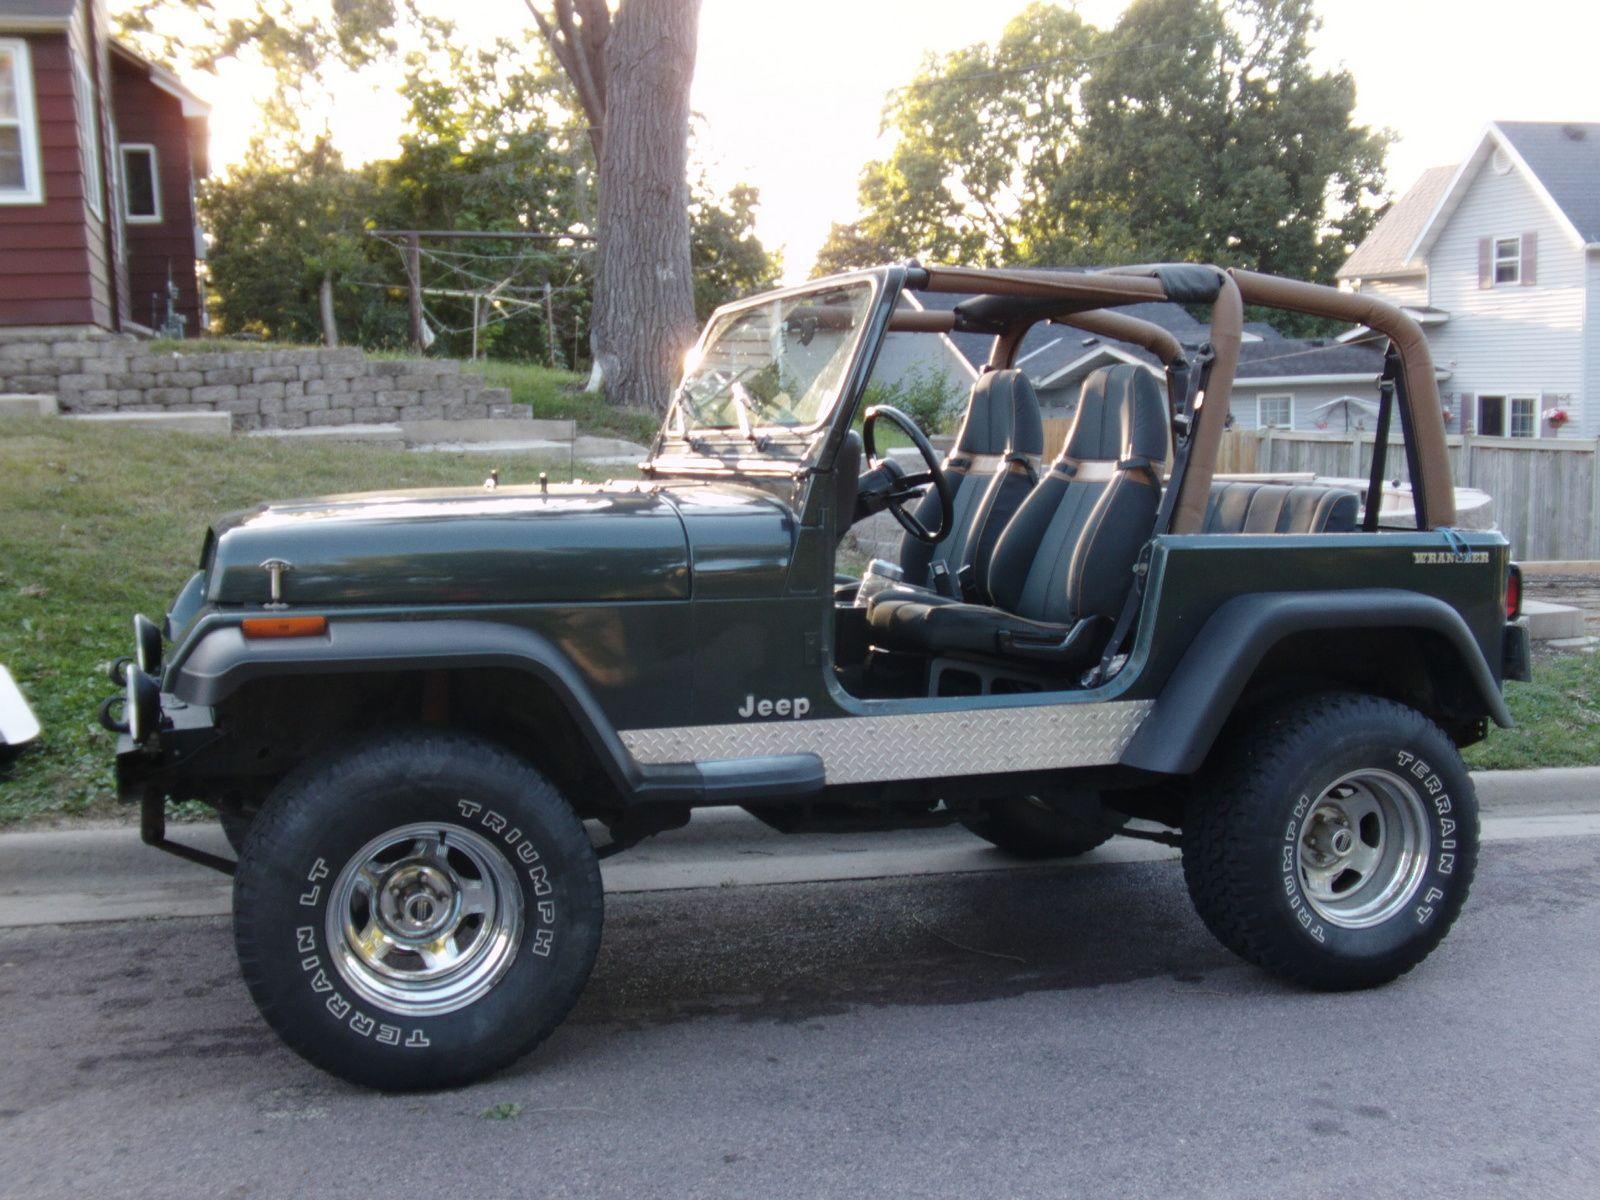 1993 Jeep Wrangler Sahara Jwsgs 1993 Jeep Wrangler 2 Dr Sahara 4wd Convertible Exterior Jeep Wrangler Sahara